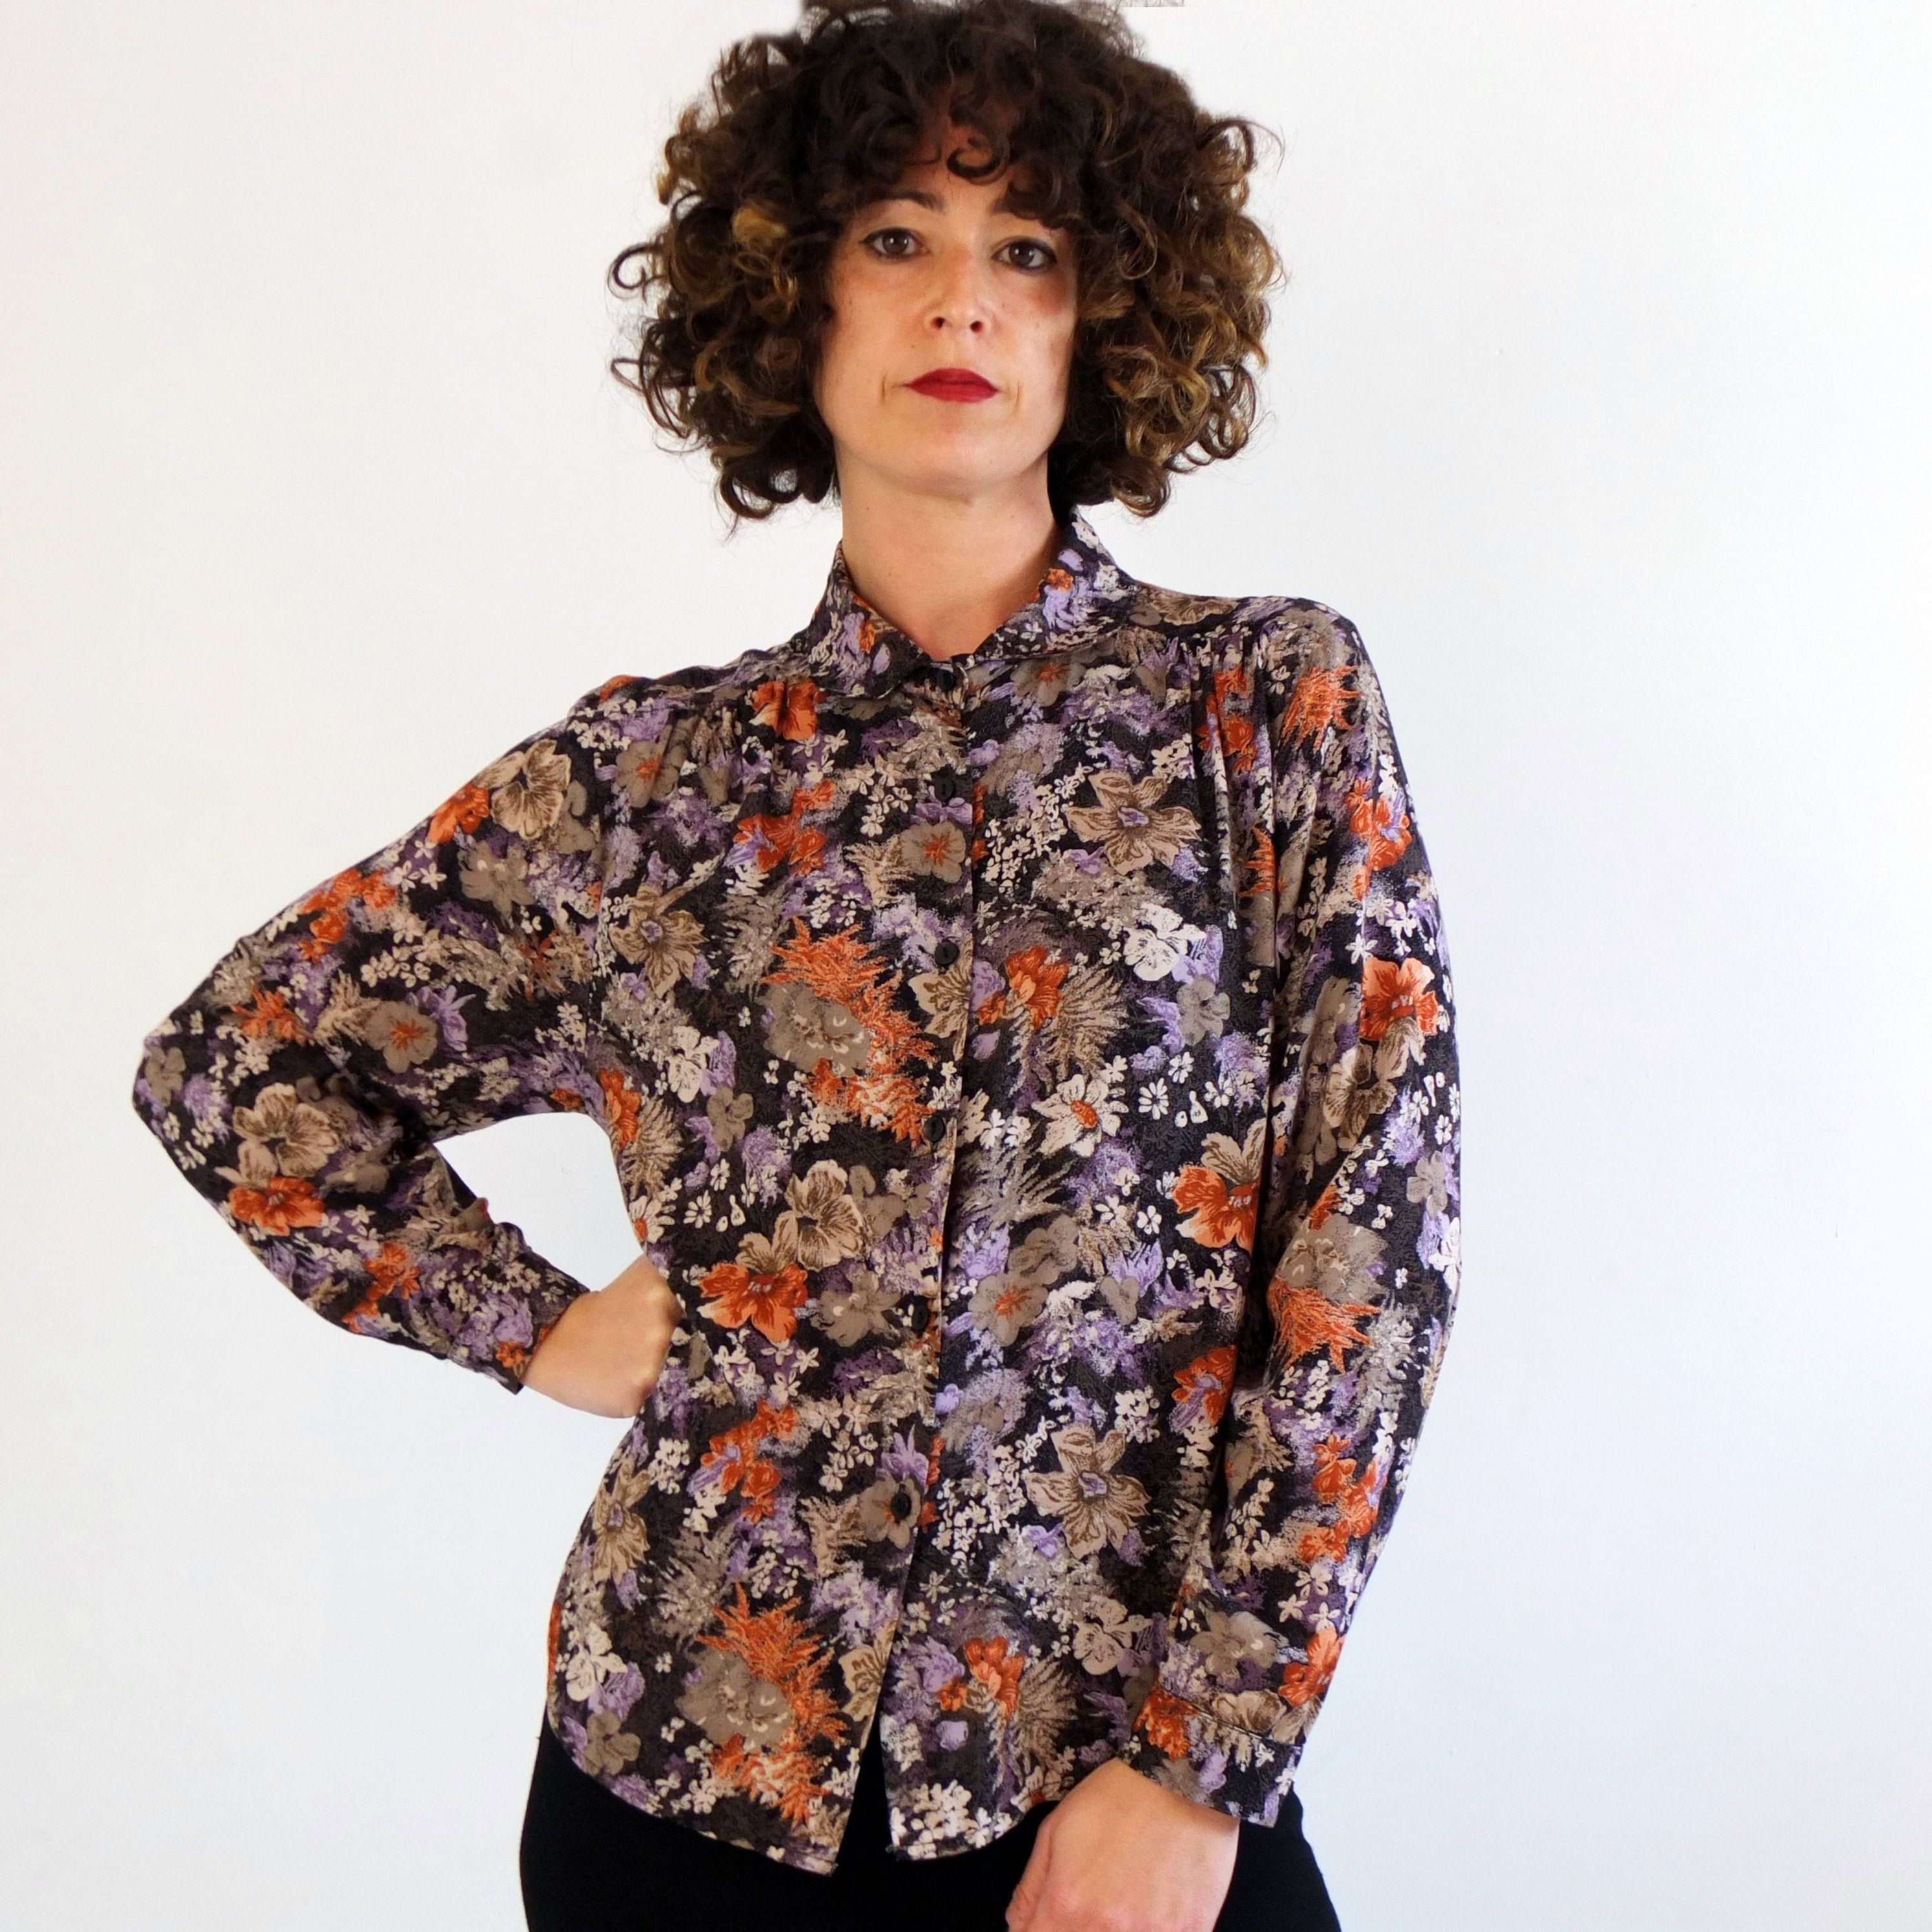 Vintage Hipster Floral Blouse Vintage Black Floral Blouse Vintage Dark Colorful Purple Blouse Women 80s Classic Feminine Blouse S In 2020 Blouse Vintage Black Floral Blouse Blouses For Women